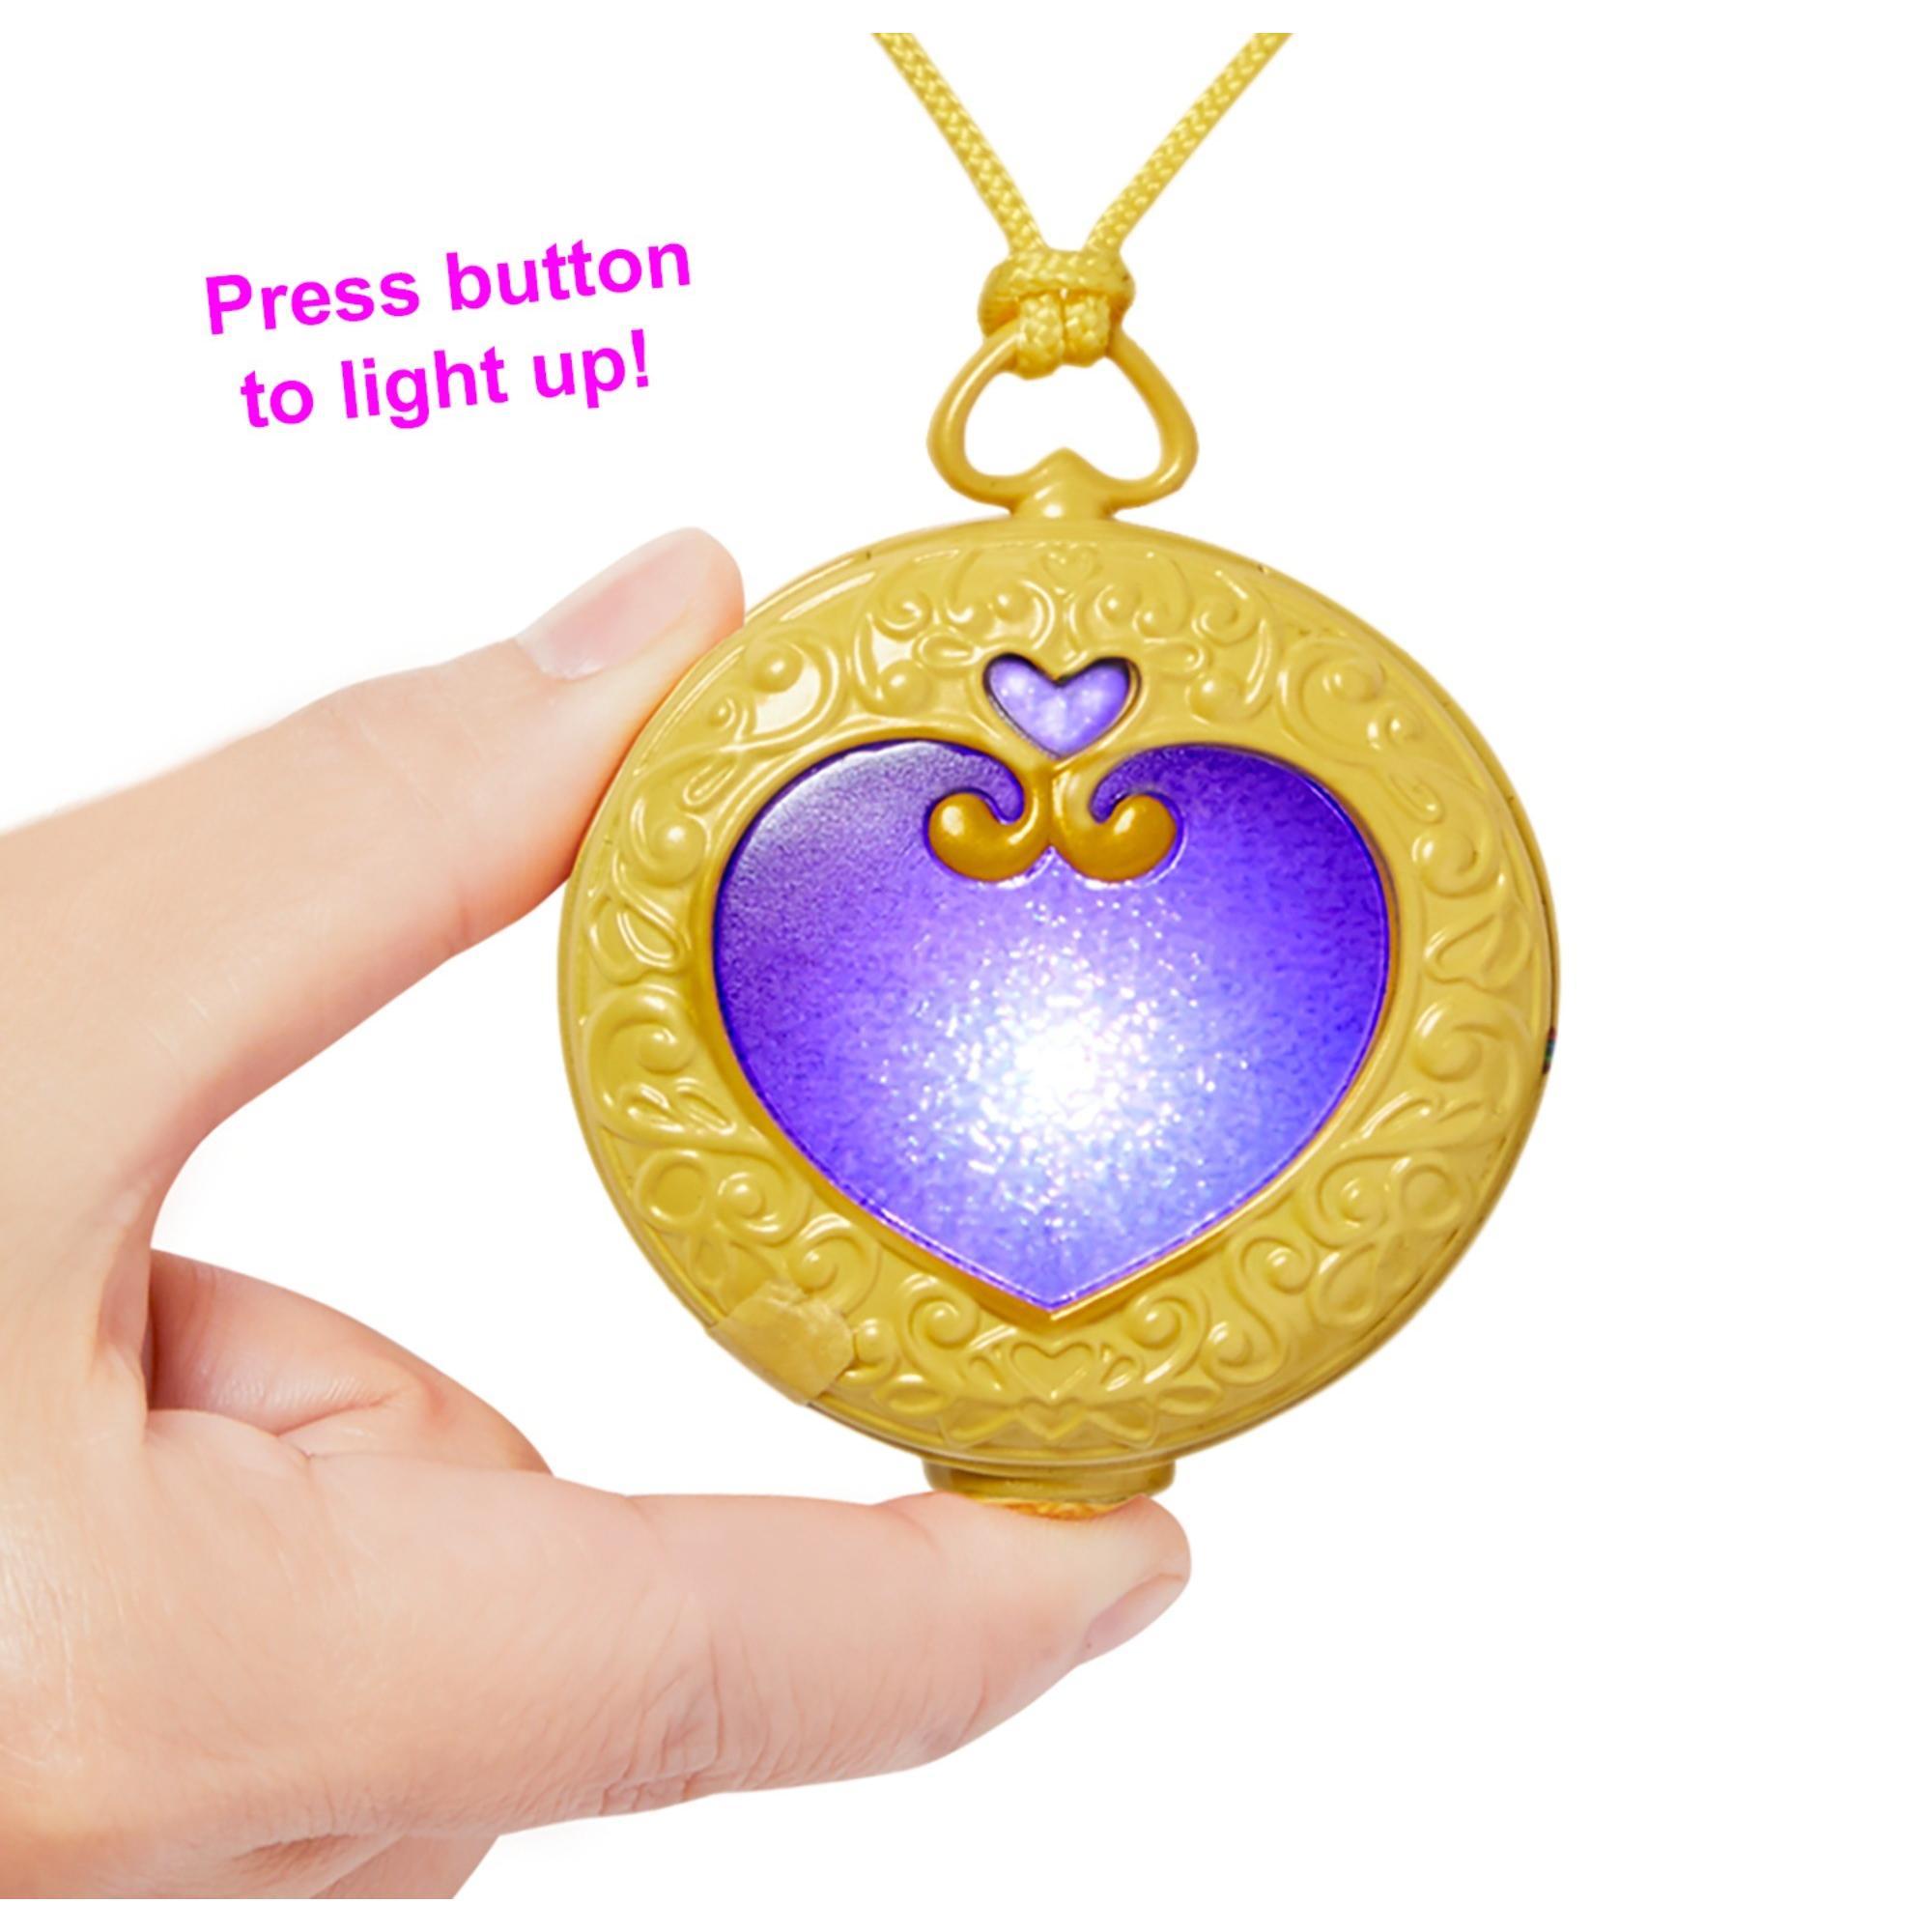 Amazon Prime: Nickelodeon Polly Pocket Tiny Power Light Up Locket $3.49 + Free Shipping